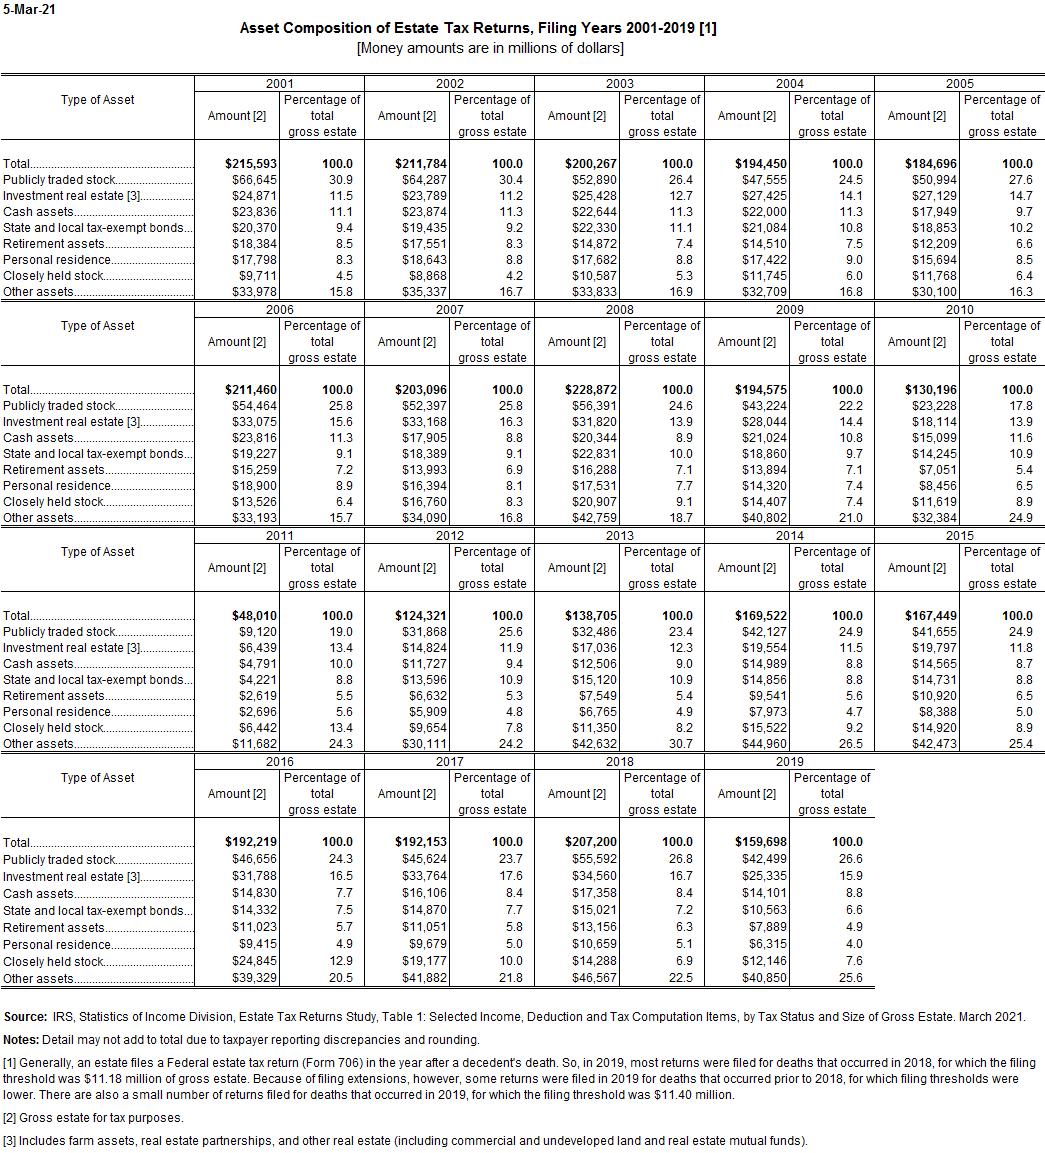 Asset composition of estate tax